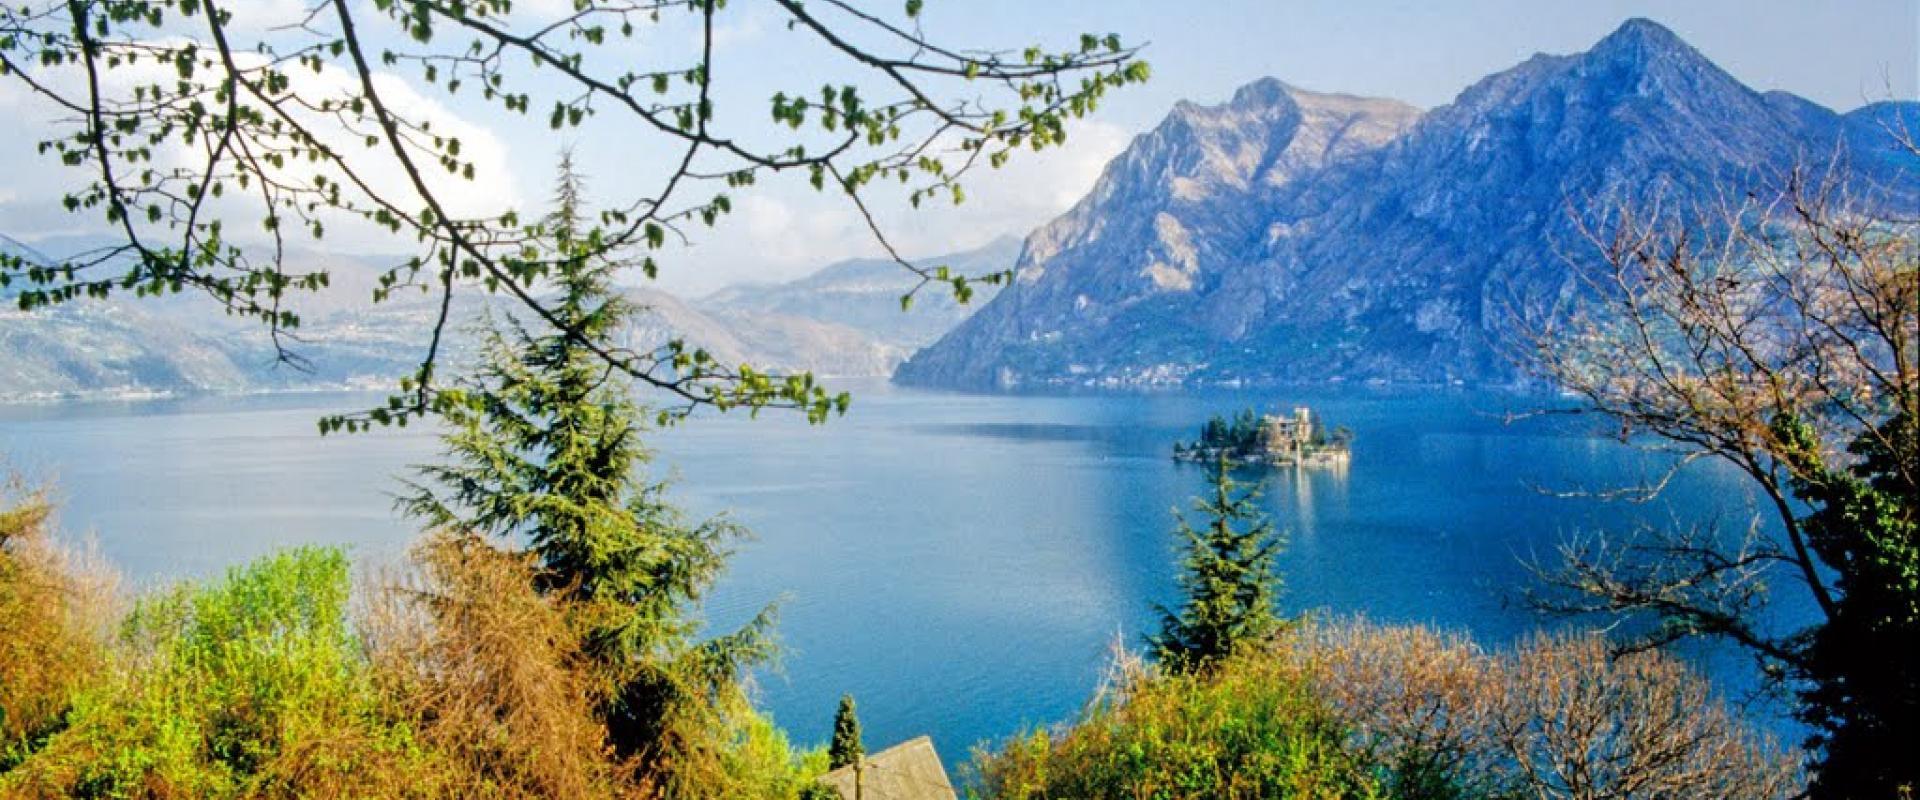 hiking experience along Iseo Lake